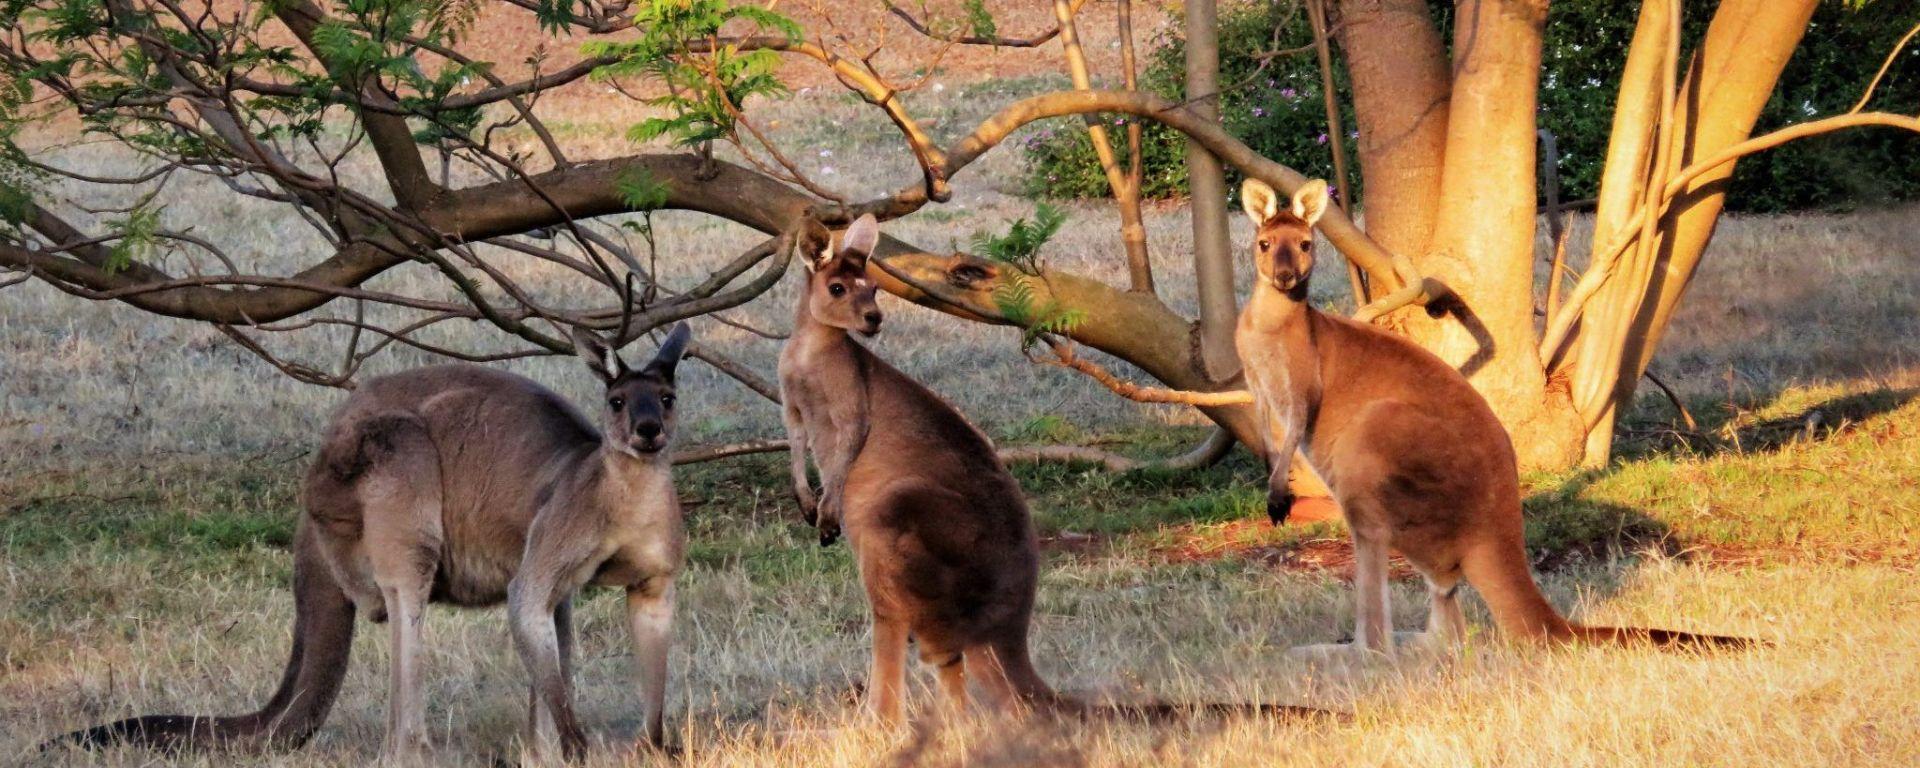 Australia, donde los canguros se aparean